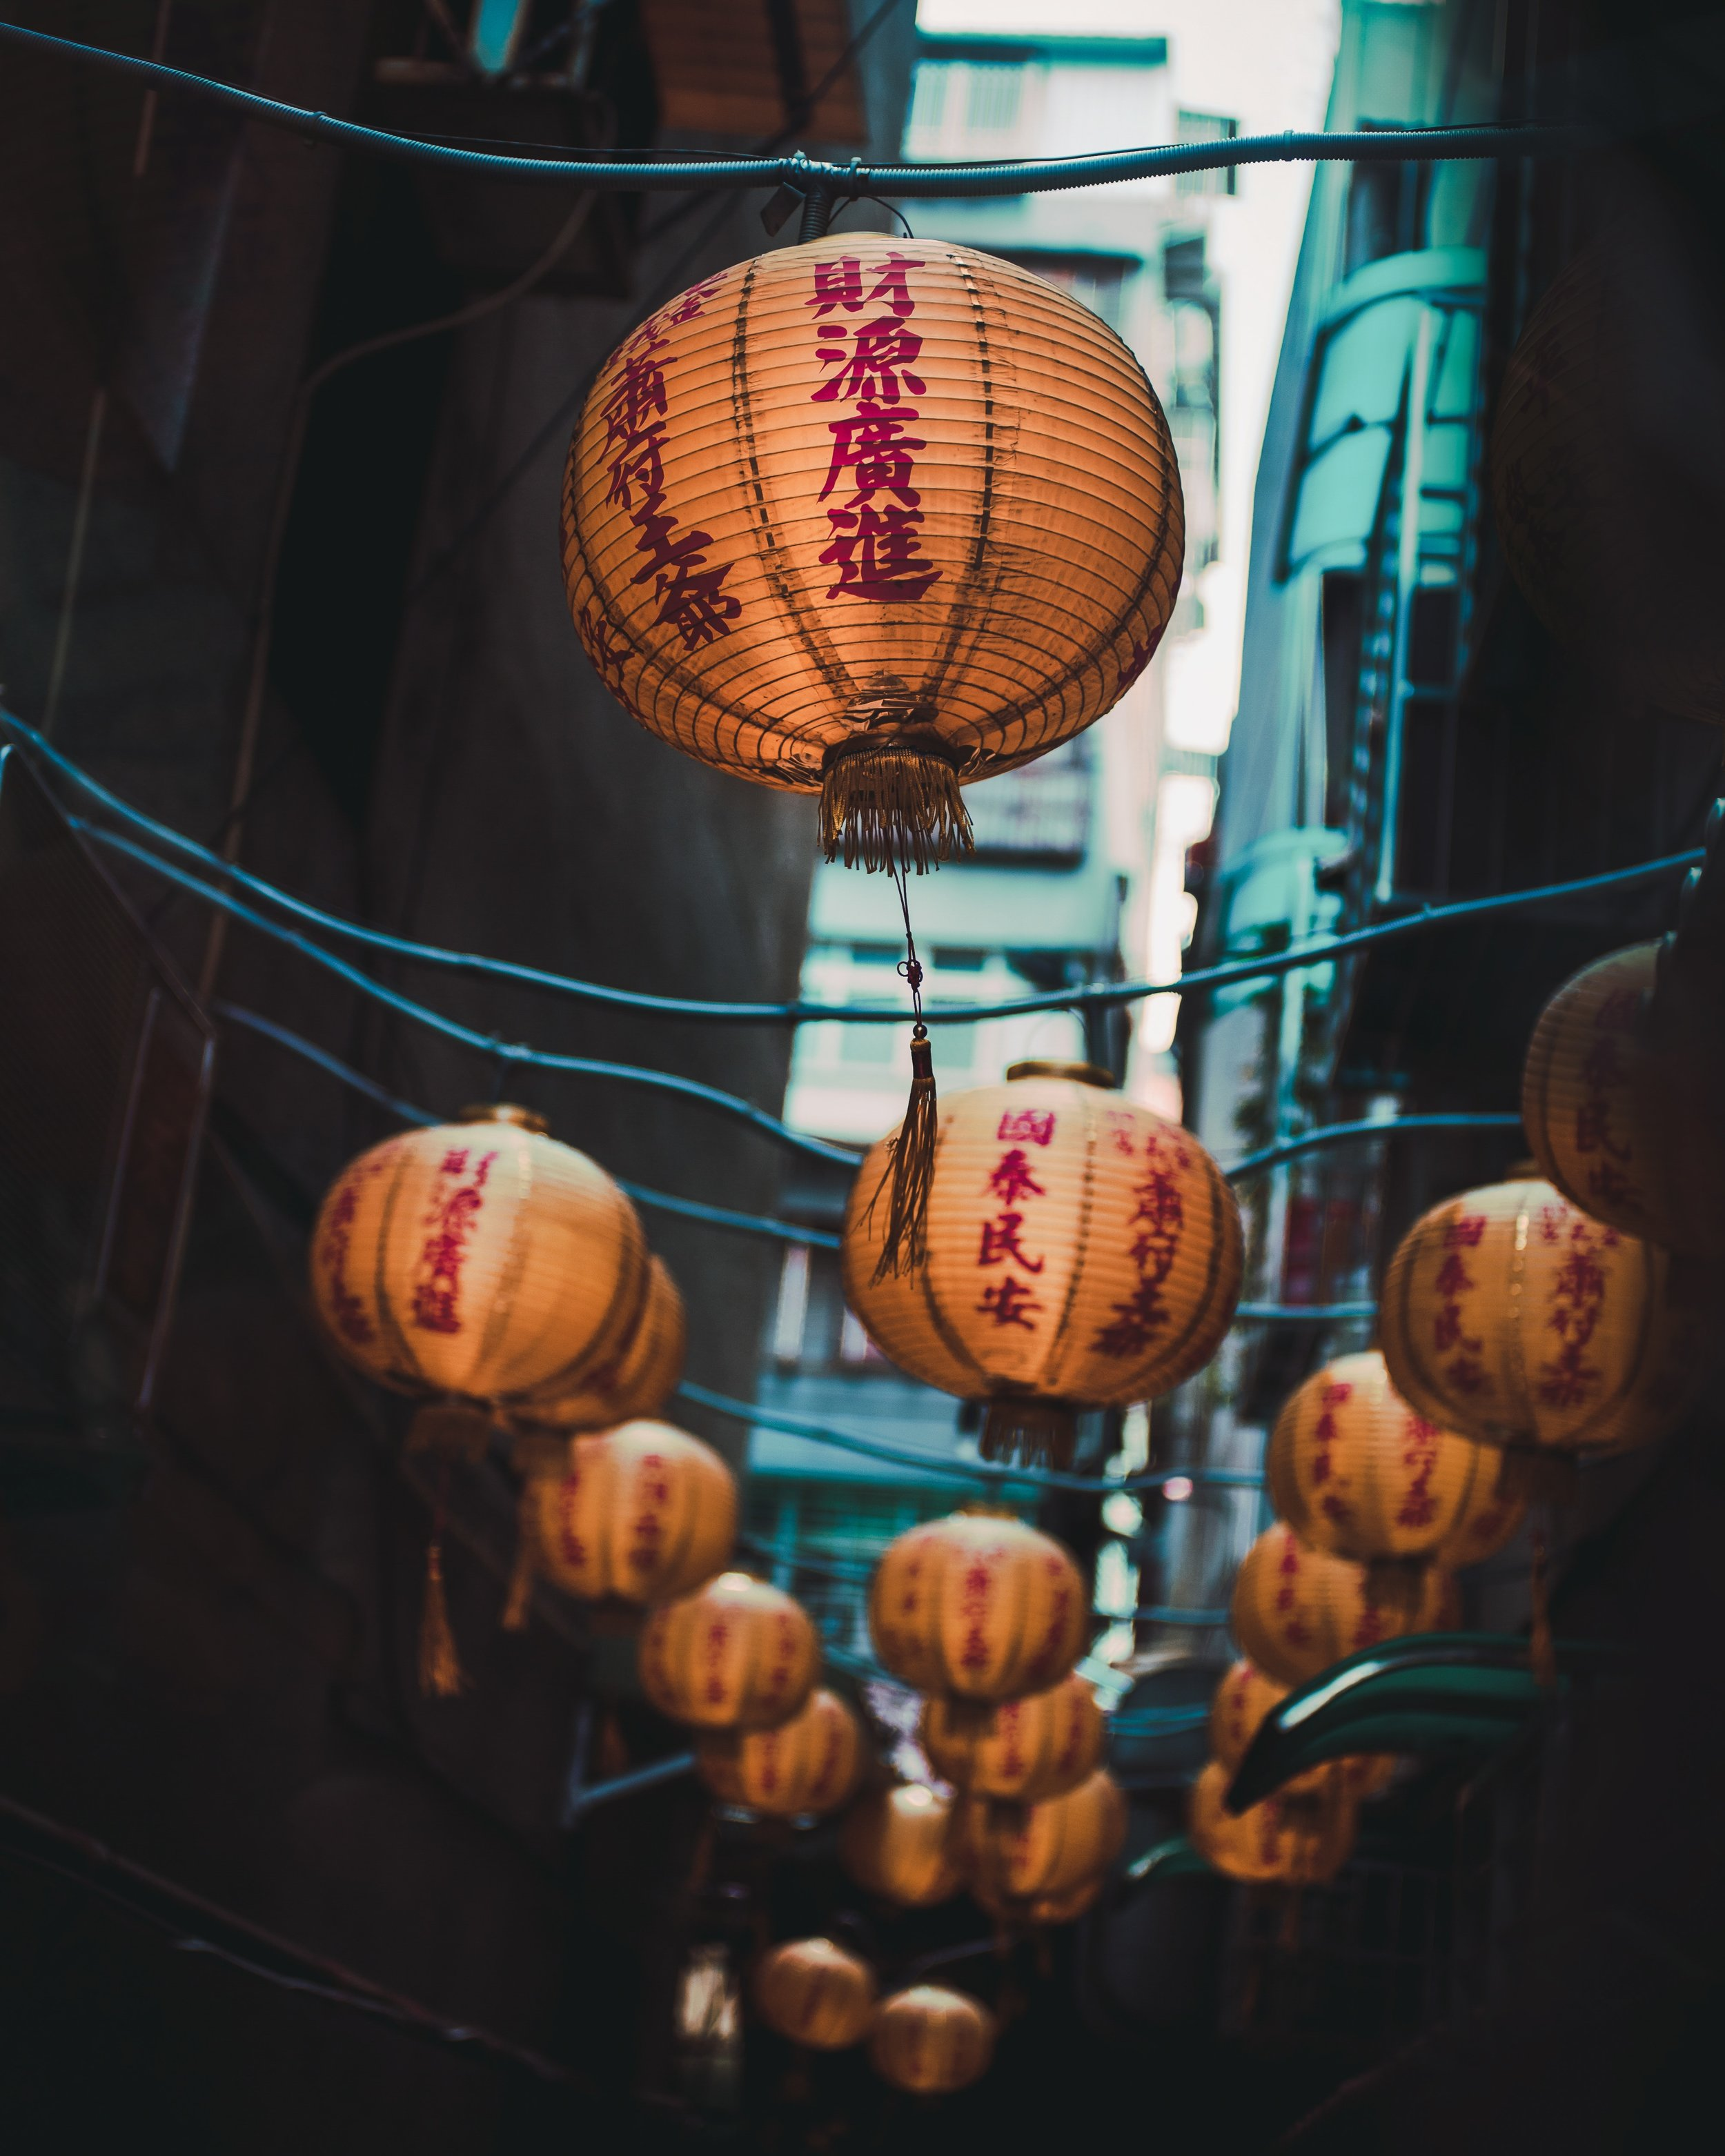 blur-chinese-lanterns-decoration-1455960.jpg